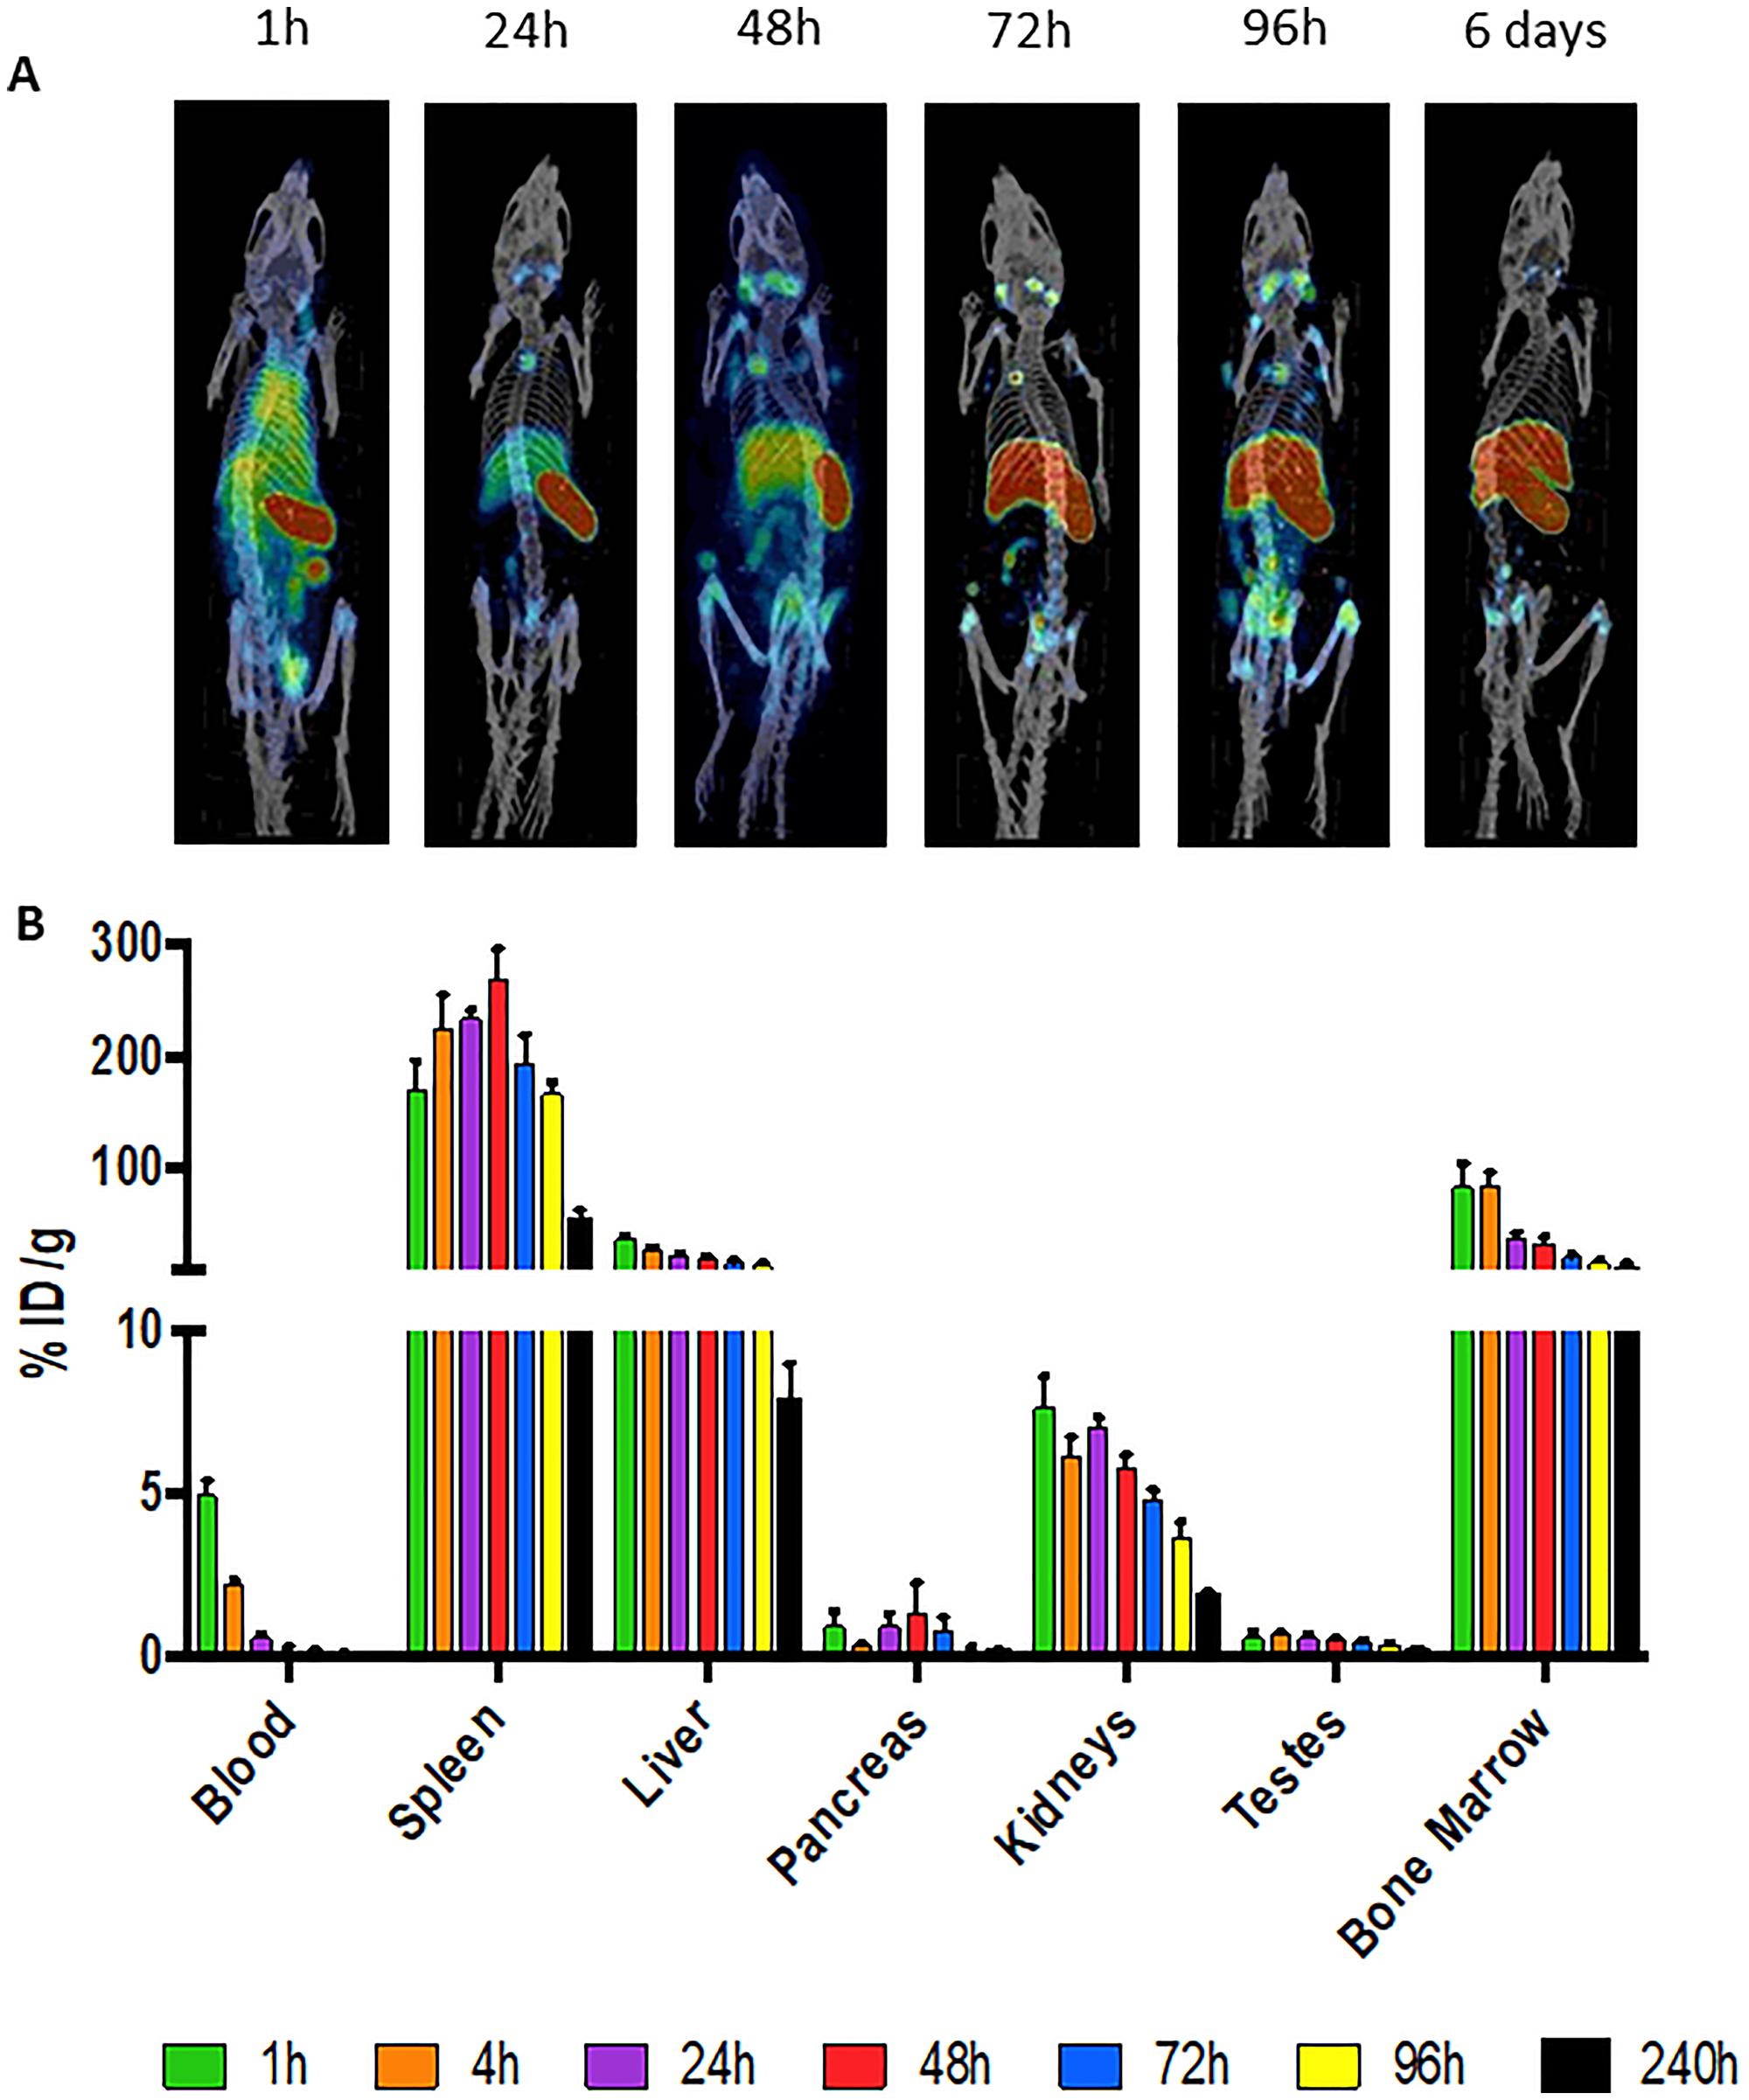 111In-30F11 anti-CD45 antibody homes to immune organs.